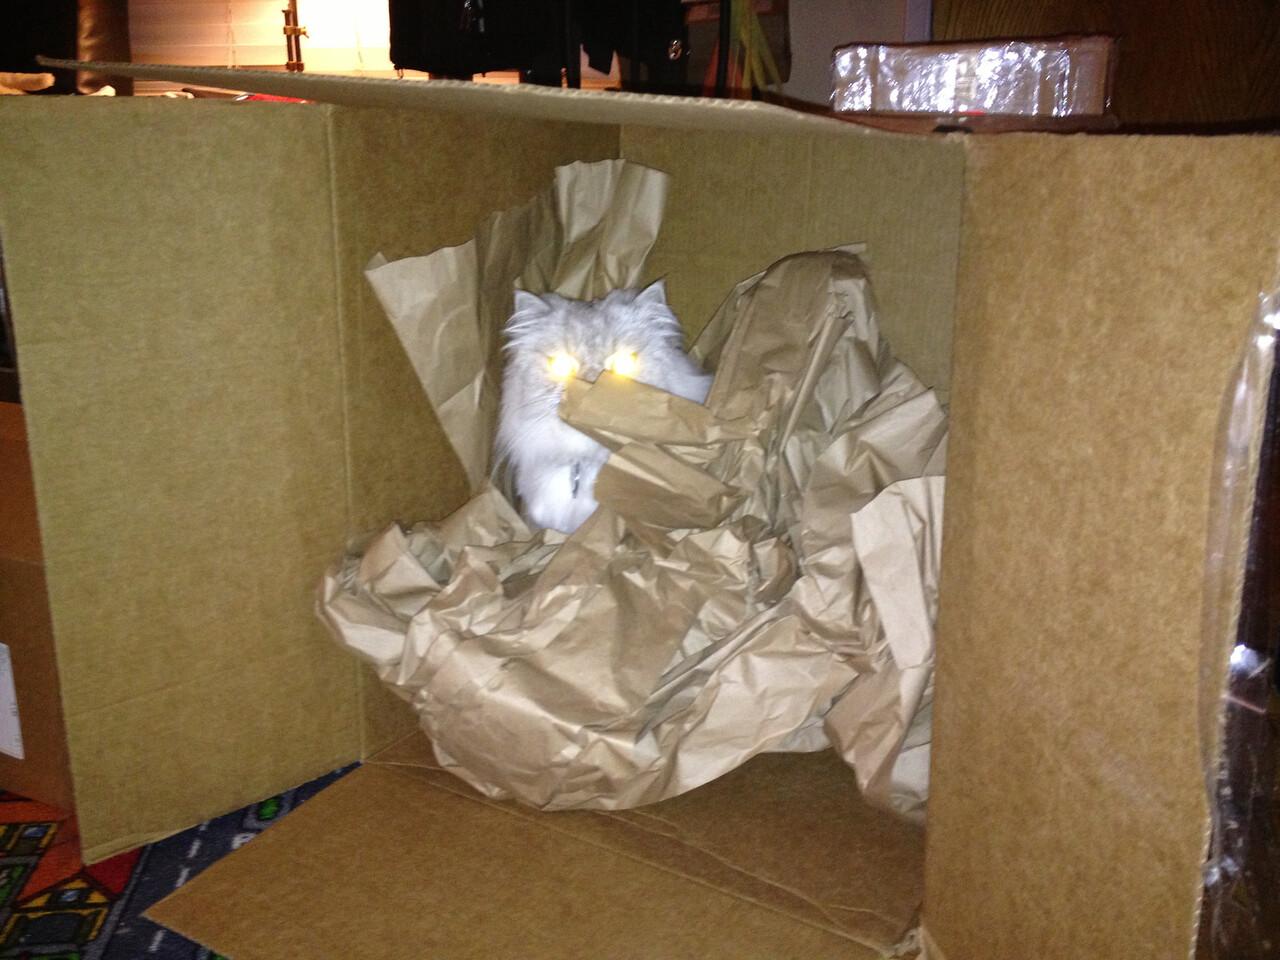 Laser eyes Herc in-a-box